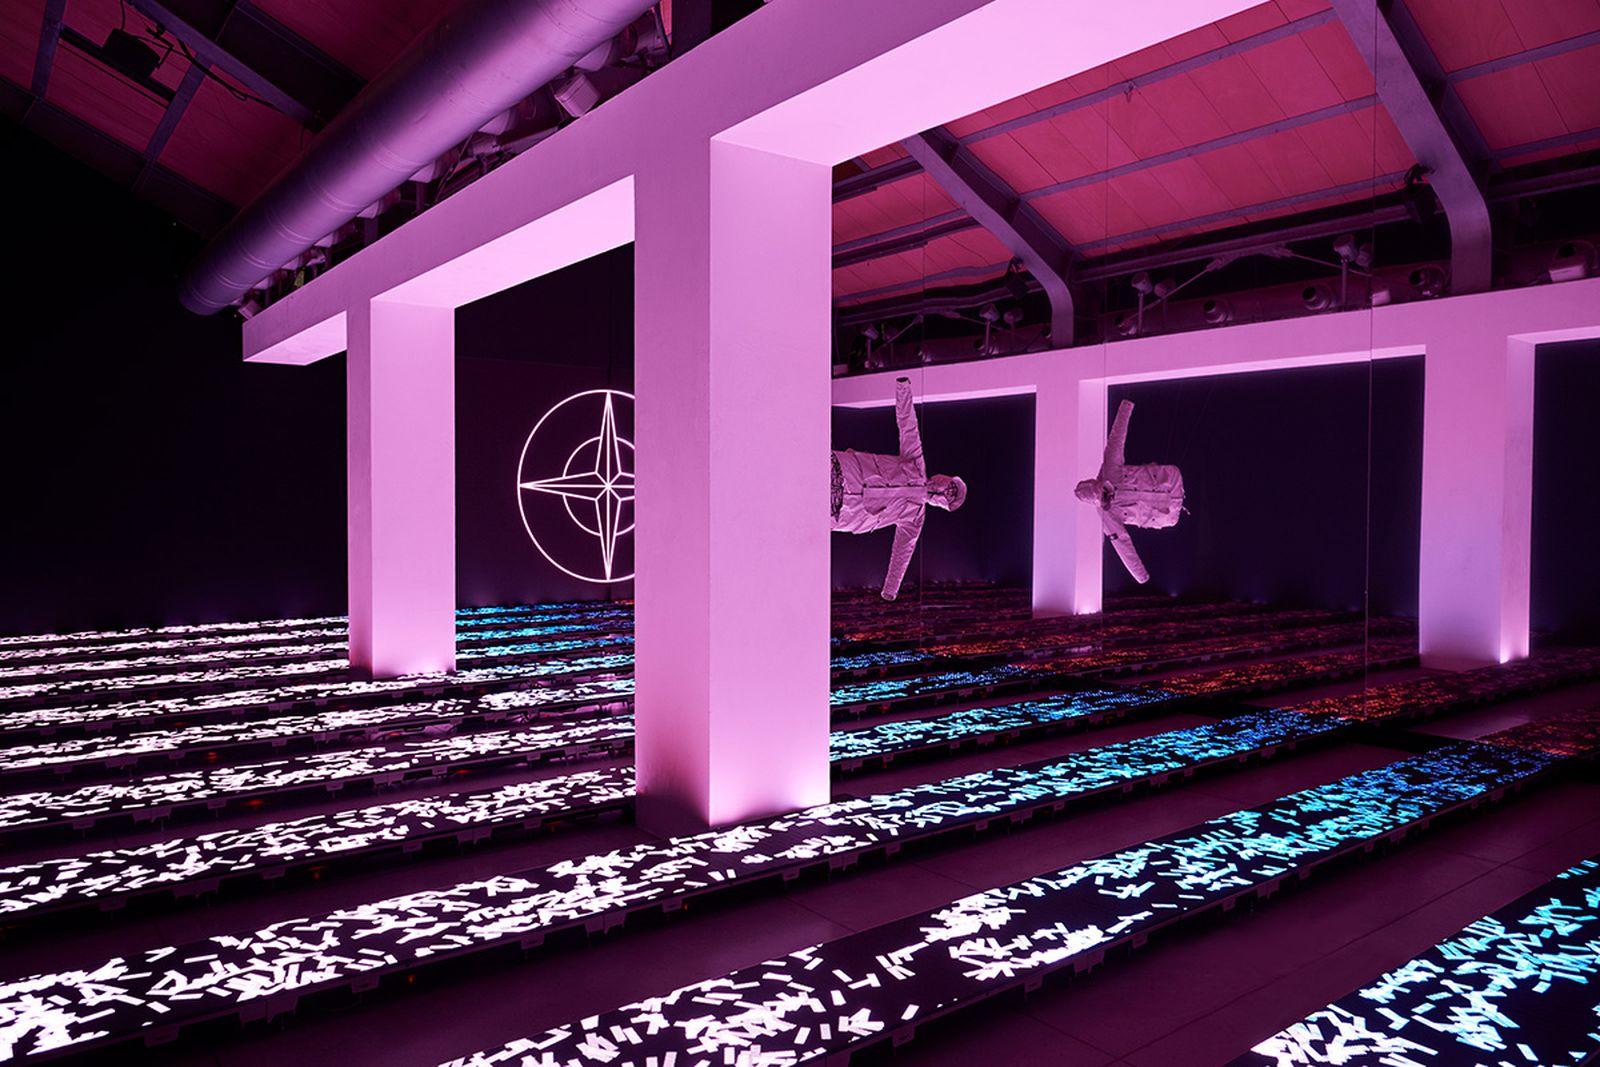 stone island prototype research series salone Milan Design Week 2019 salone del mobile